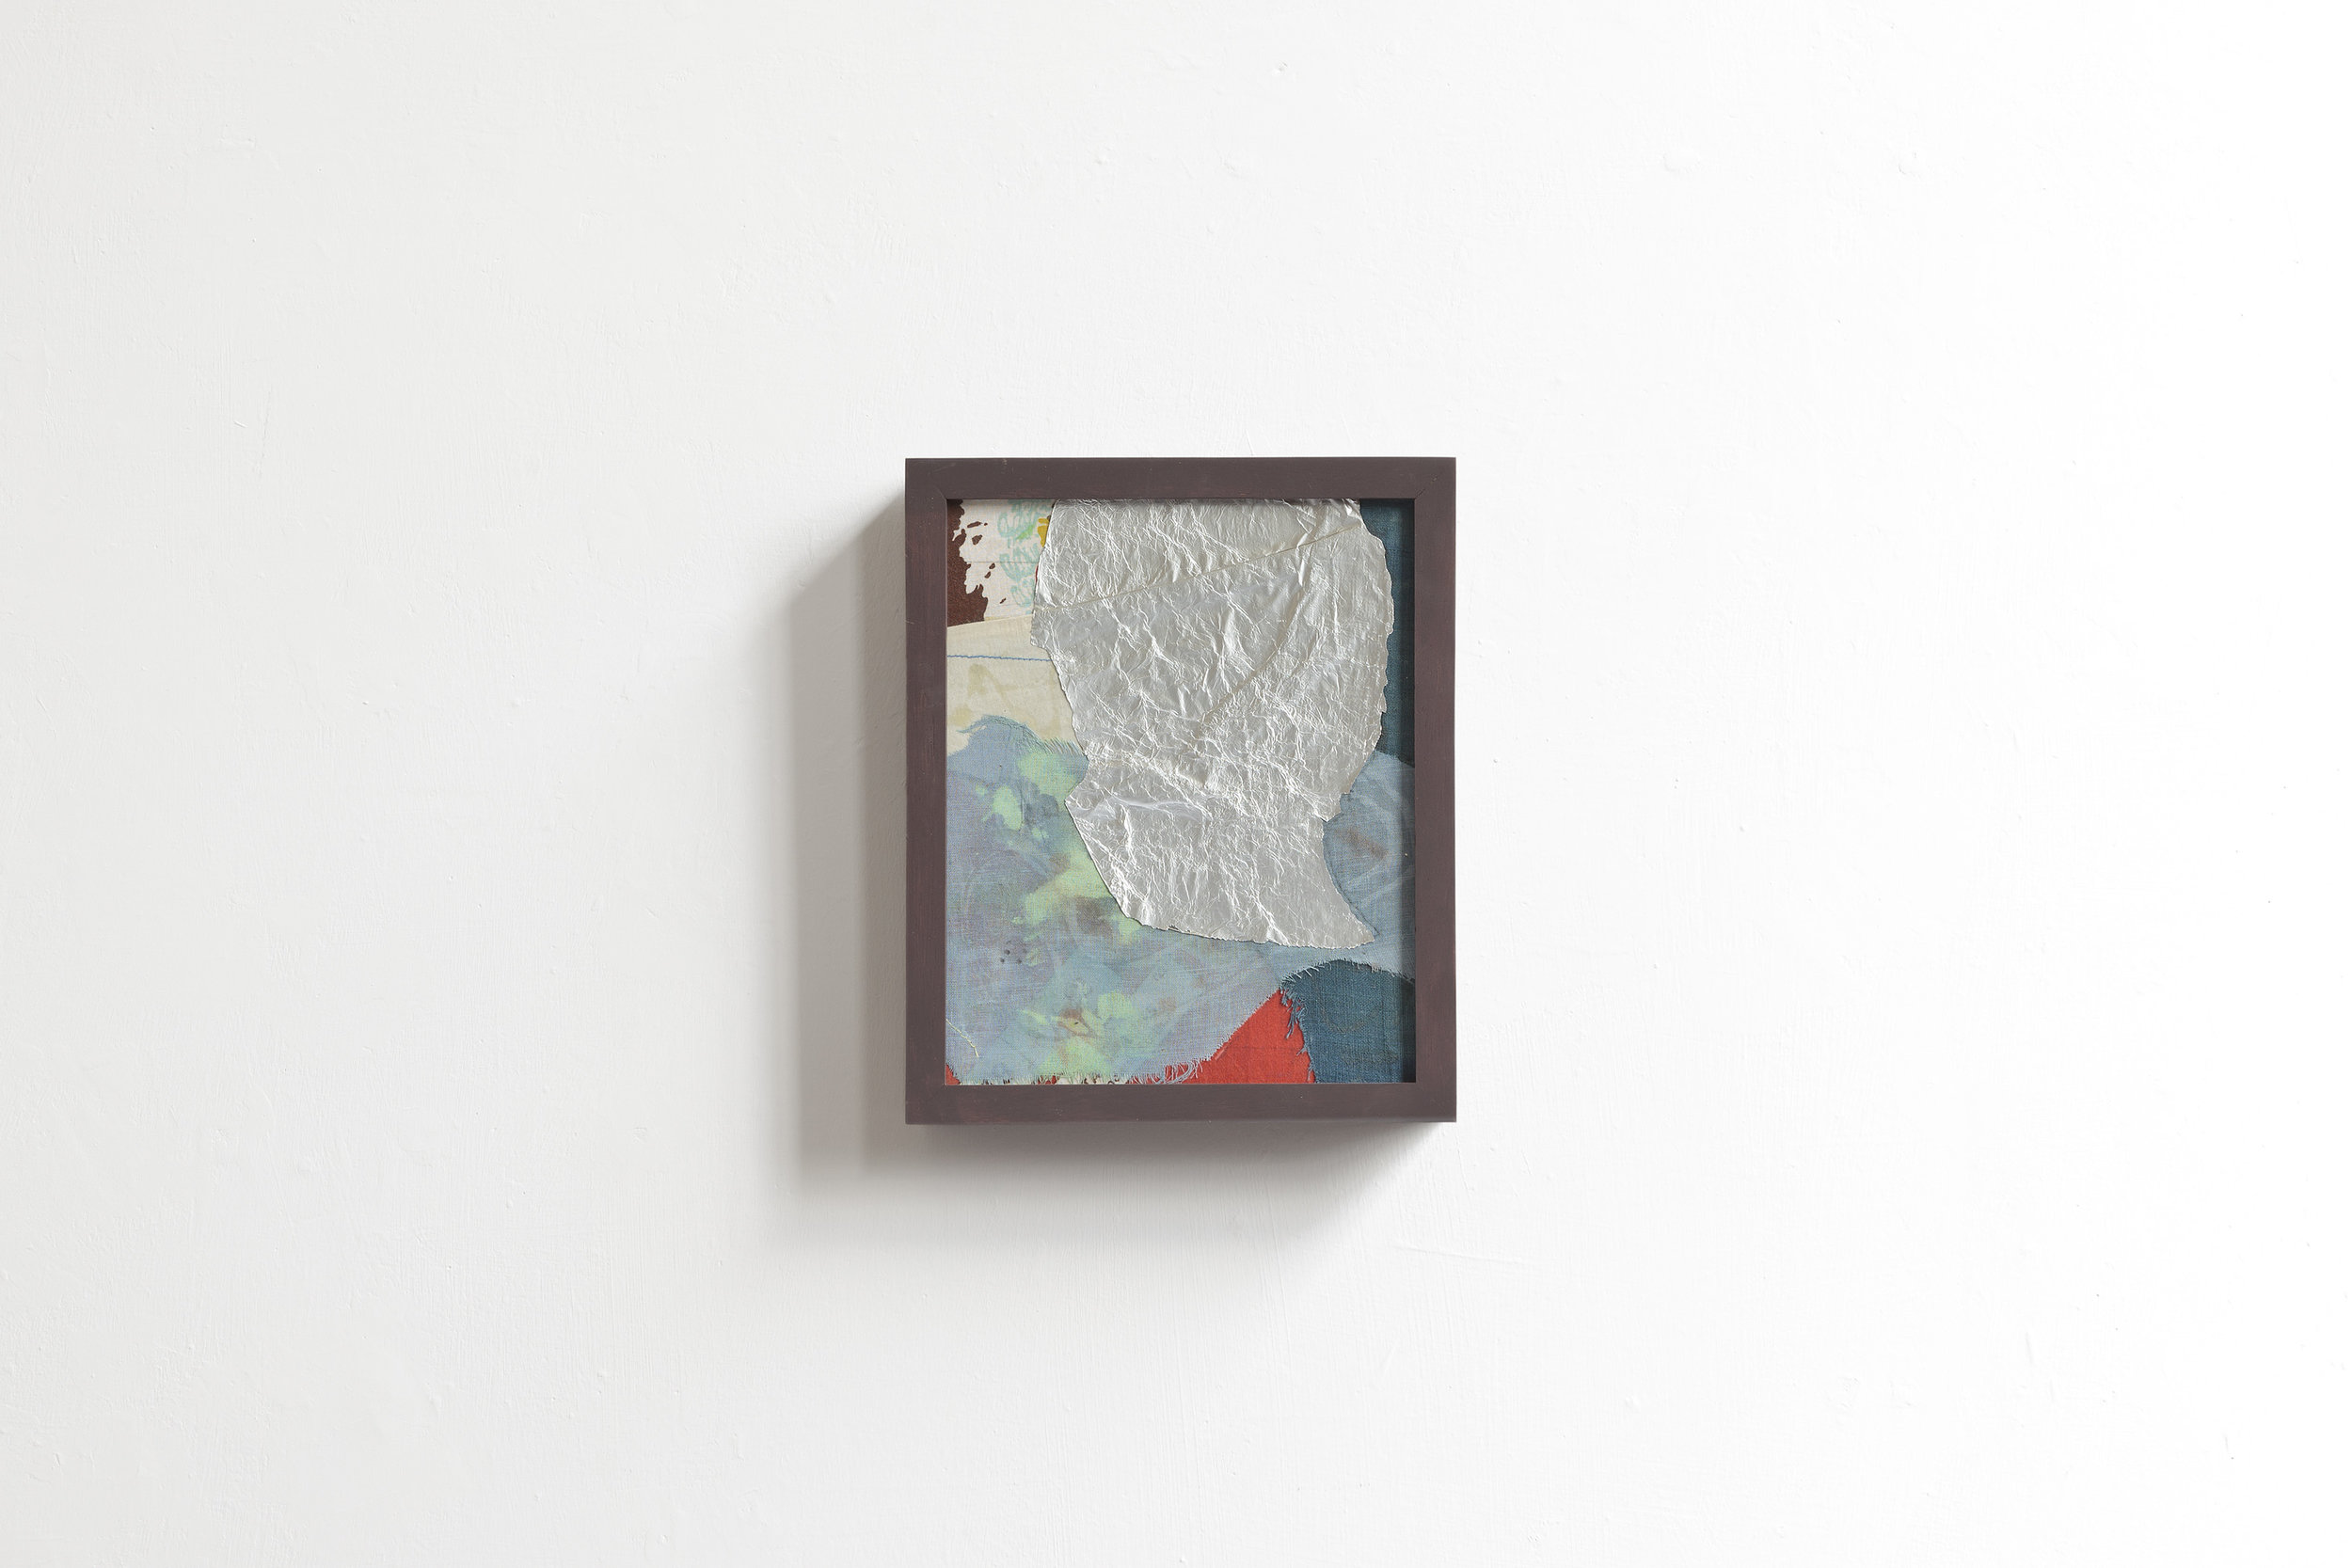 P#1  2017 - mixed media on wood - cm 25x20x5